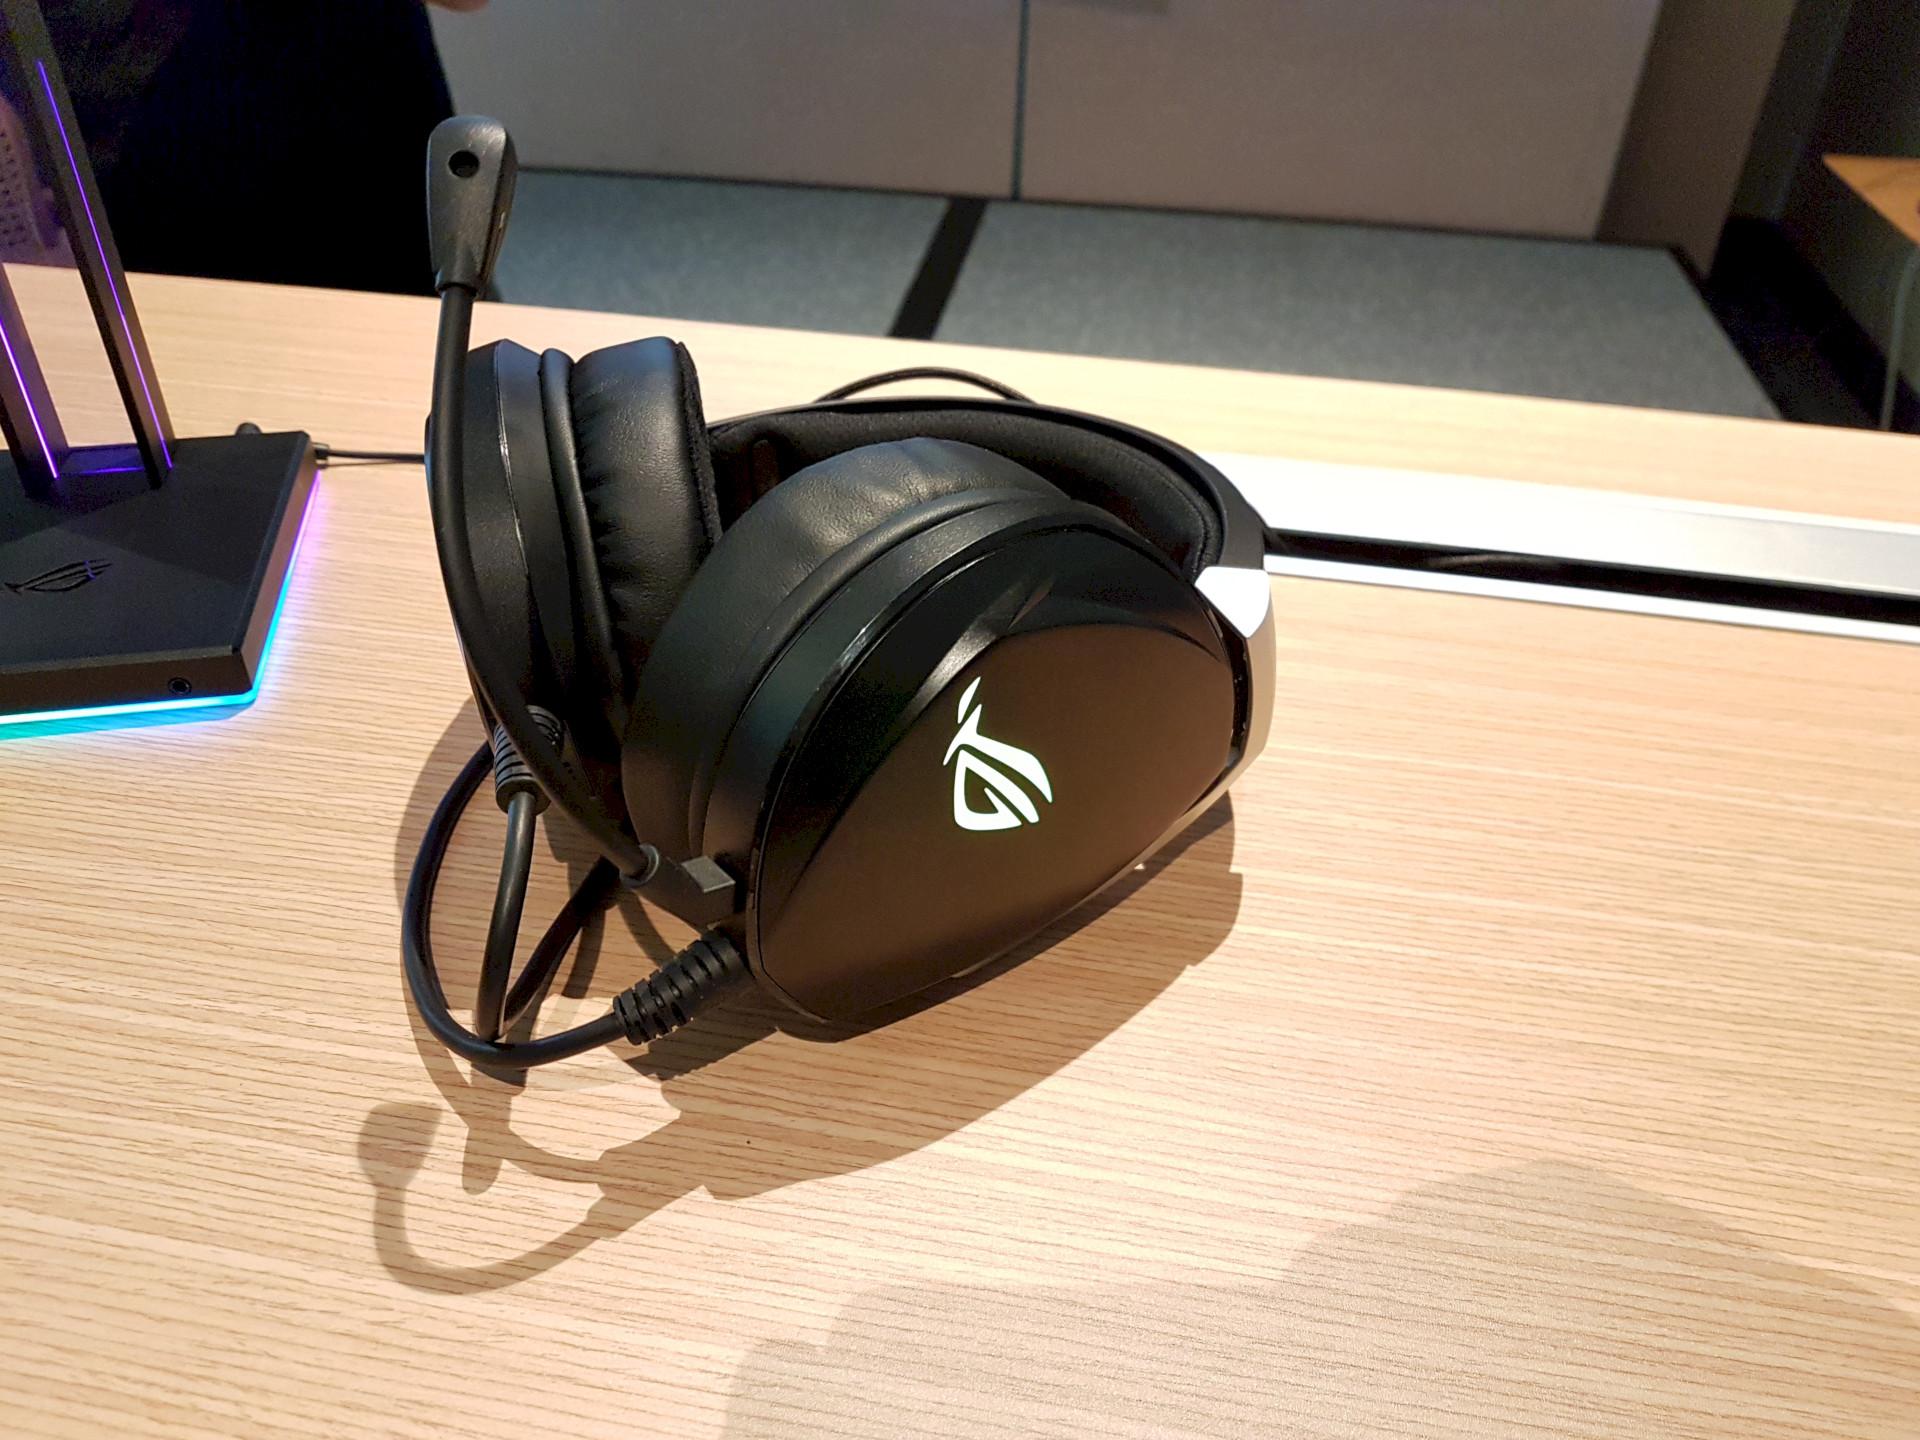 Image 1 : Computex : Asus propose deux casques audio gaming de luxe, Hi-Fi et 7.1